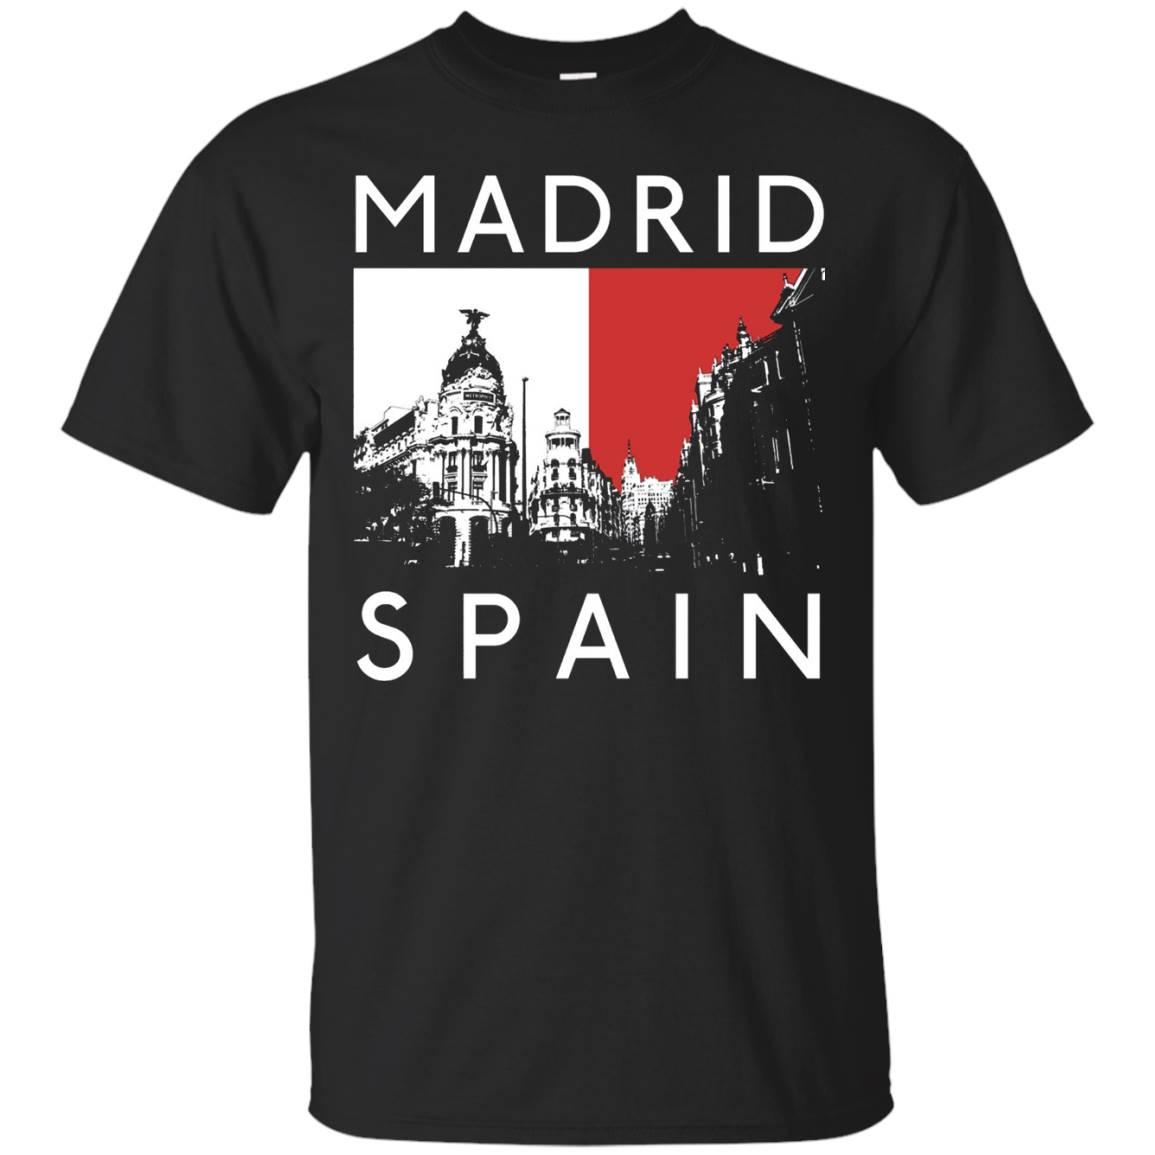 Madrid Spain Spanish Tourist Souvenir Espana Funny T-Shirt